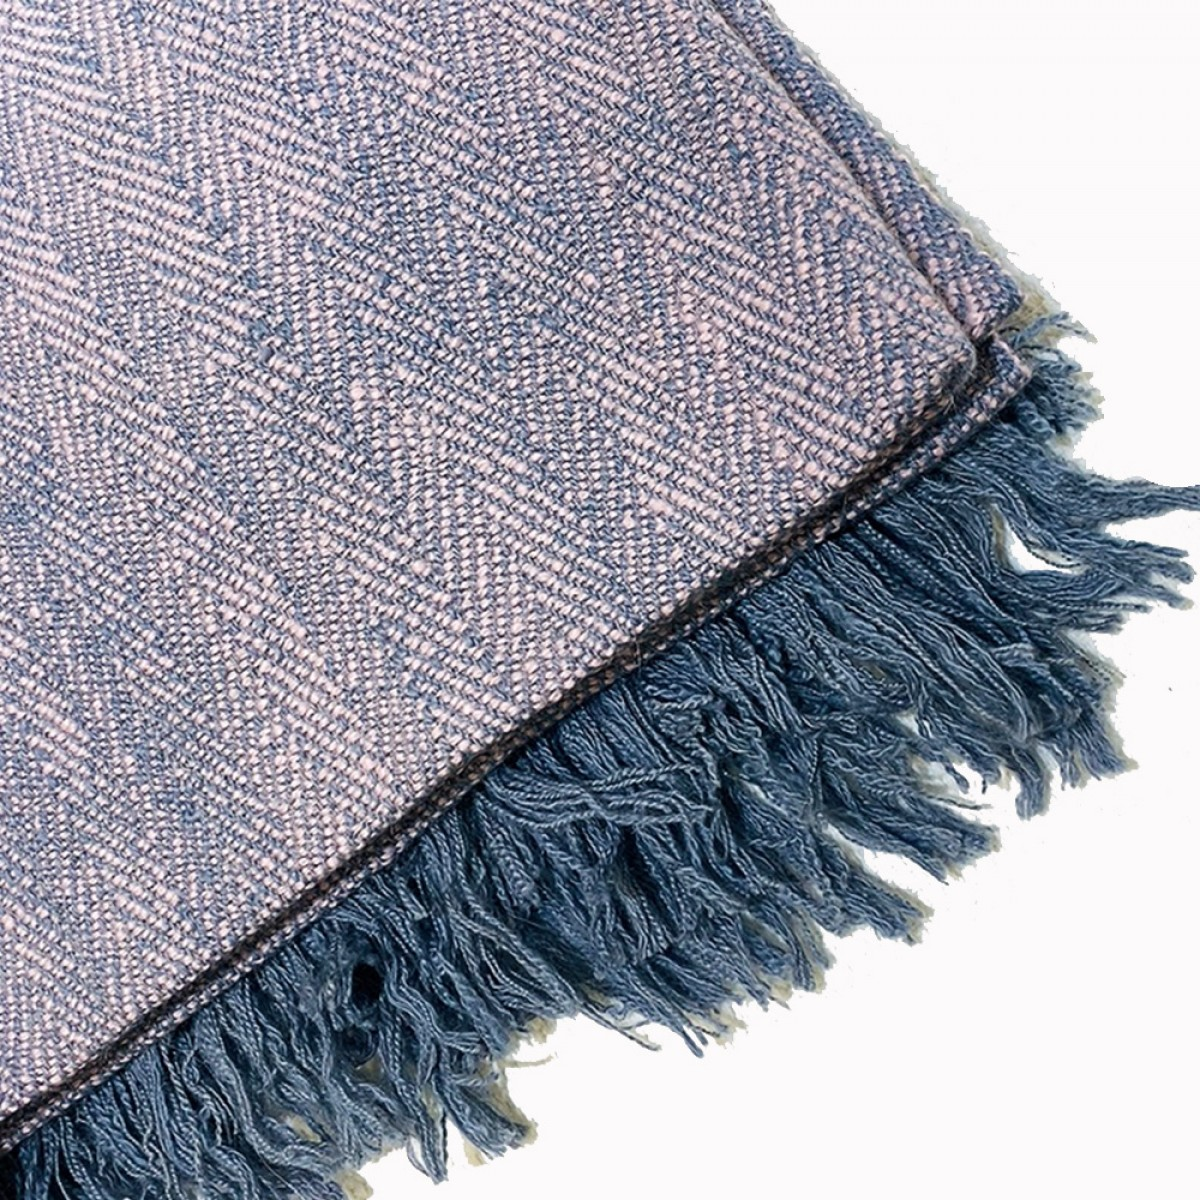 Light Grey & Pink Herringbone Weave Cashmere Blanket